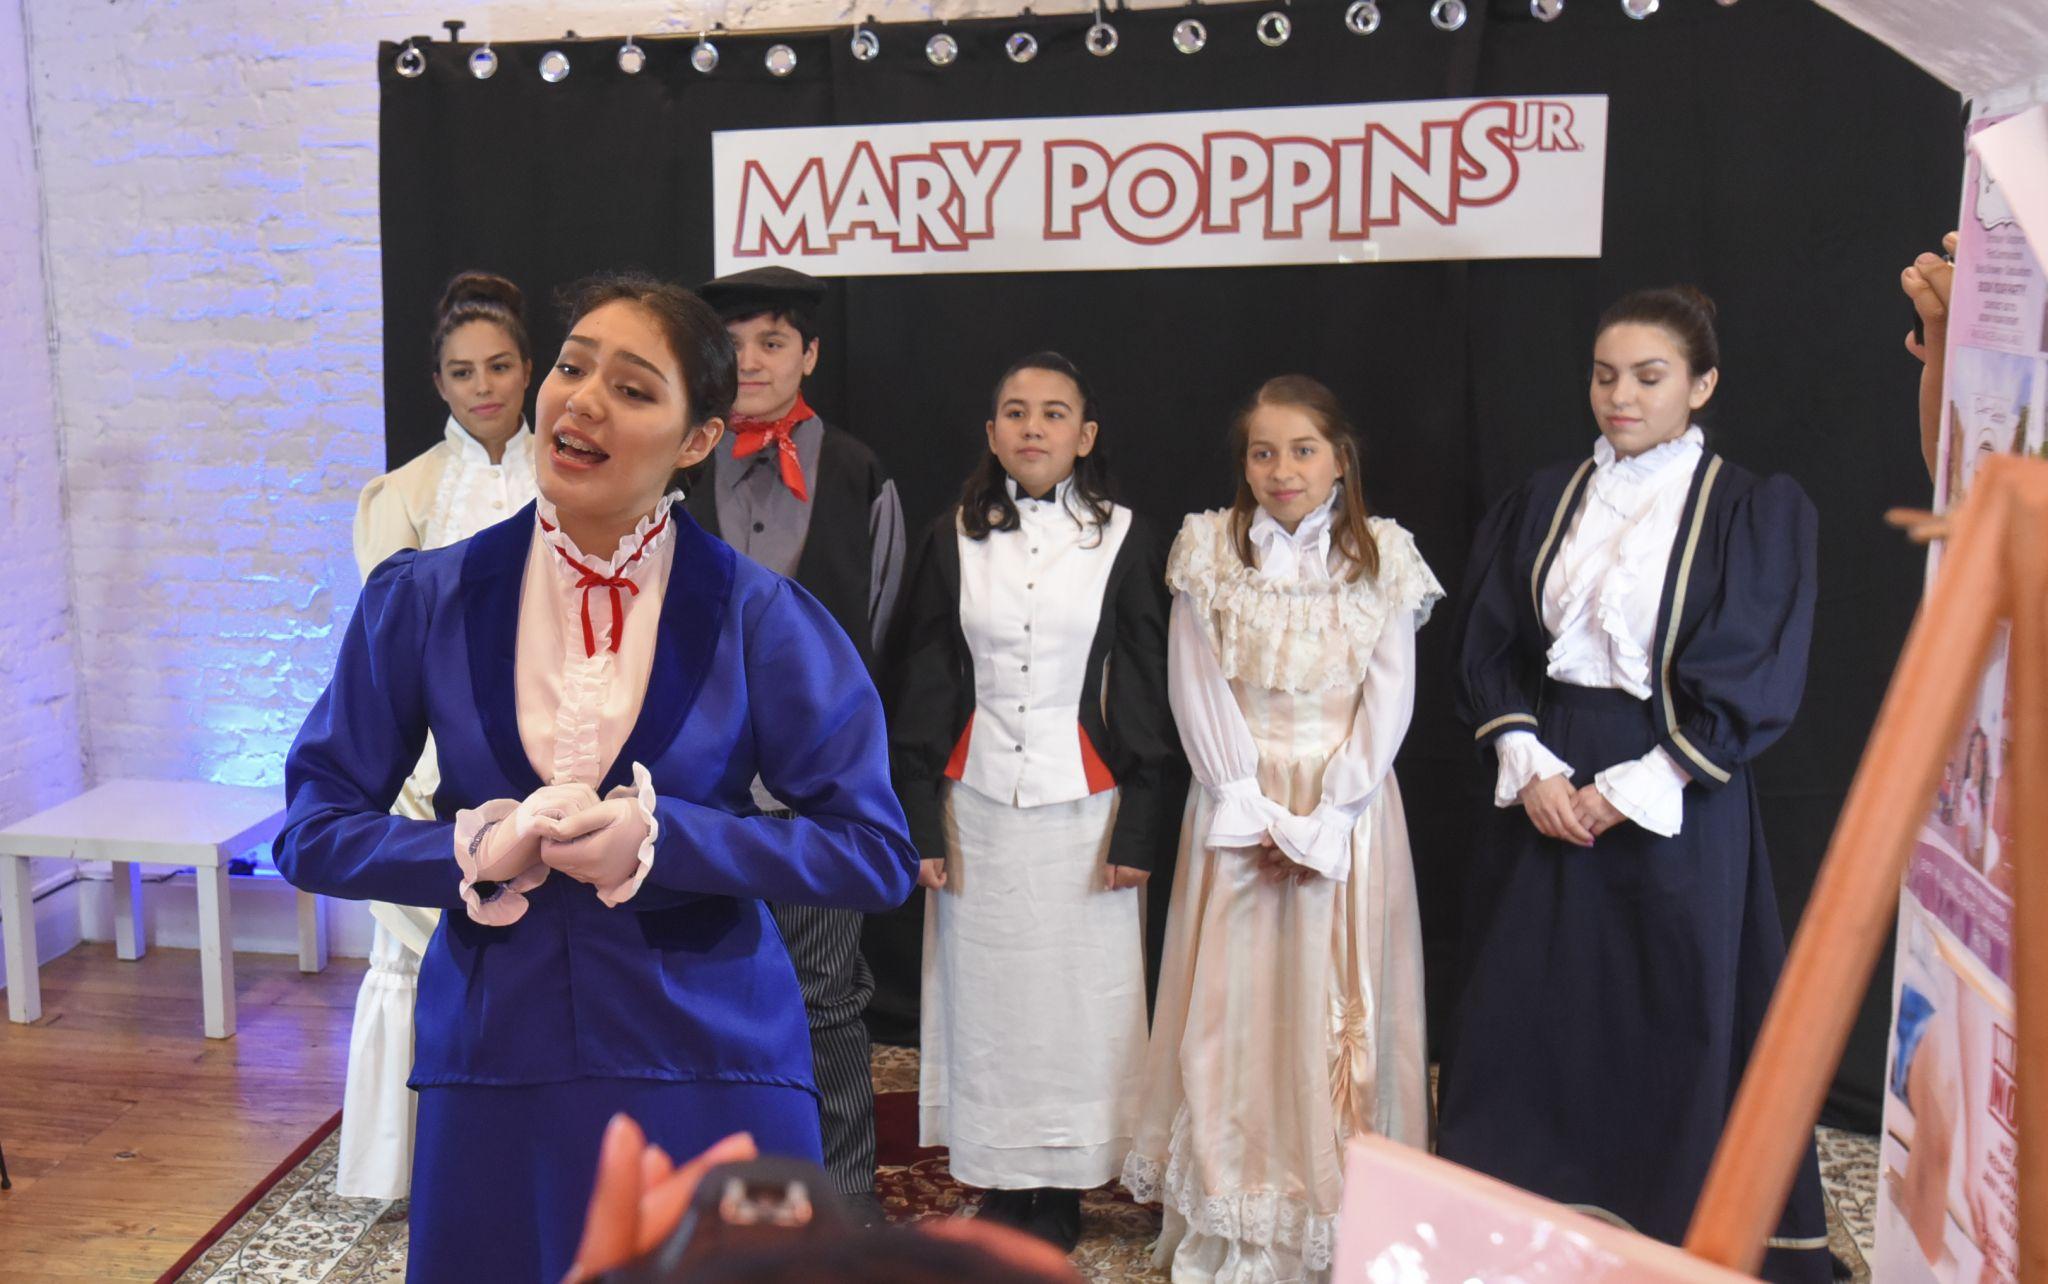 "Angelica Sofia Saenz mary poppins jr."" show will go on despite loss of cast"